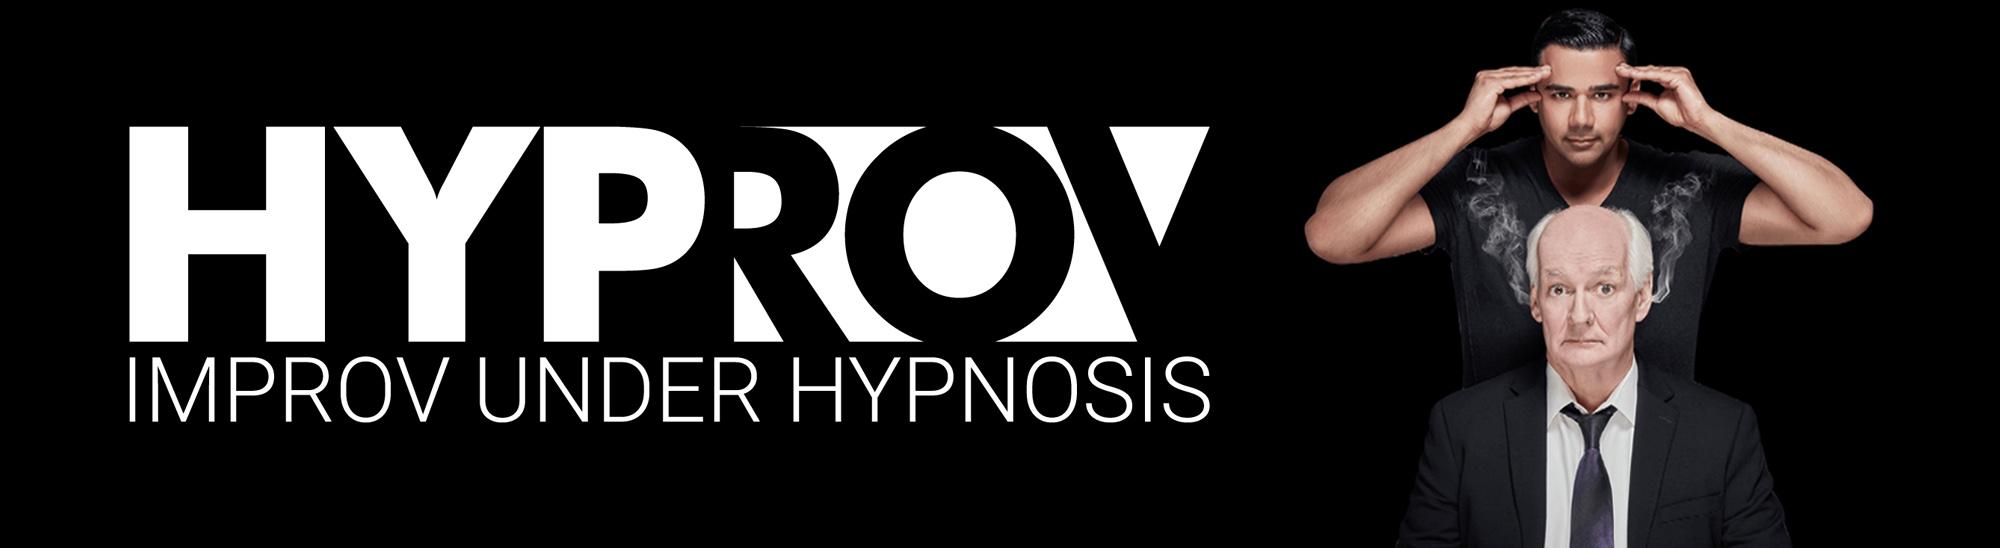 colin-mochries-hyprov-improv-under-hypnosis